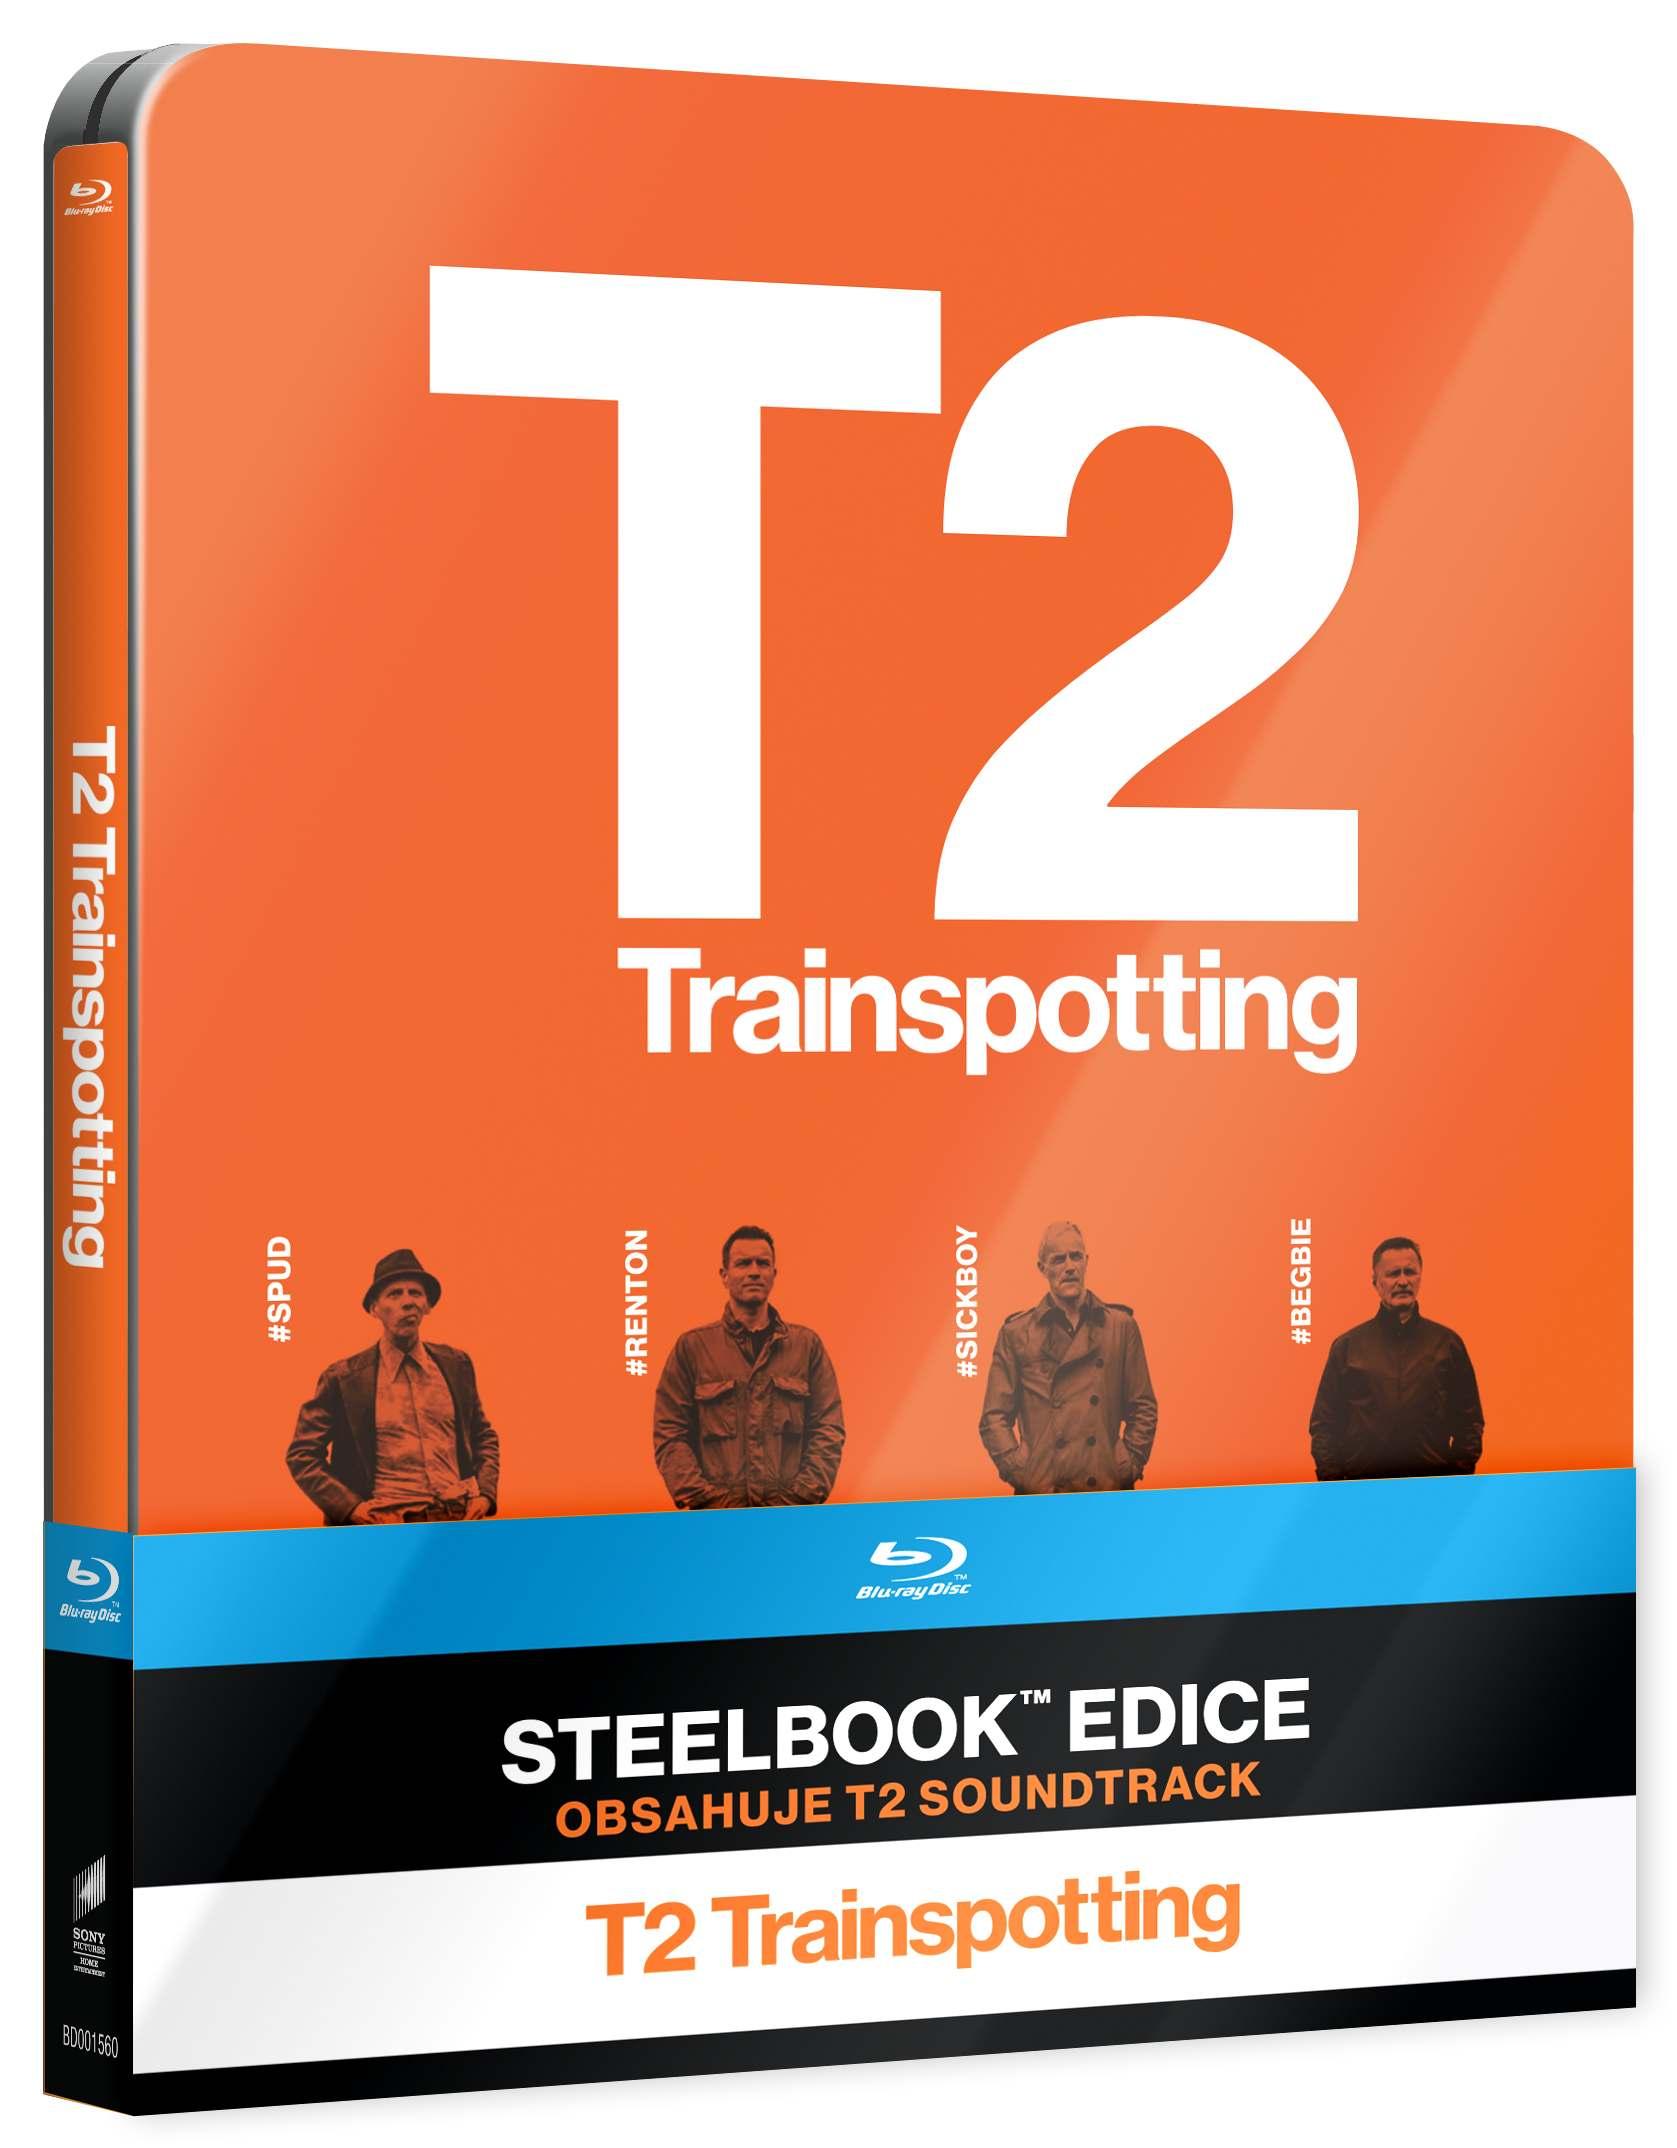 T2 TRAINSPOTTING - Blu-ray STEELBOOK + CD Soundtrack